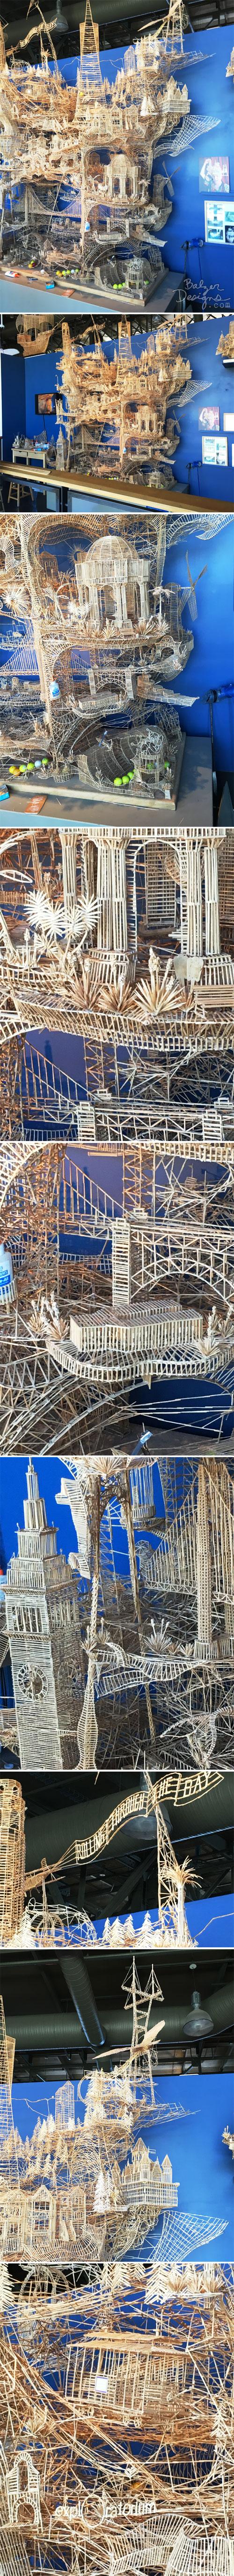 From the Balzer Designs Blog: Exploring the San Francisco Exploratorium